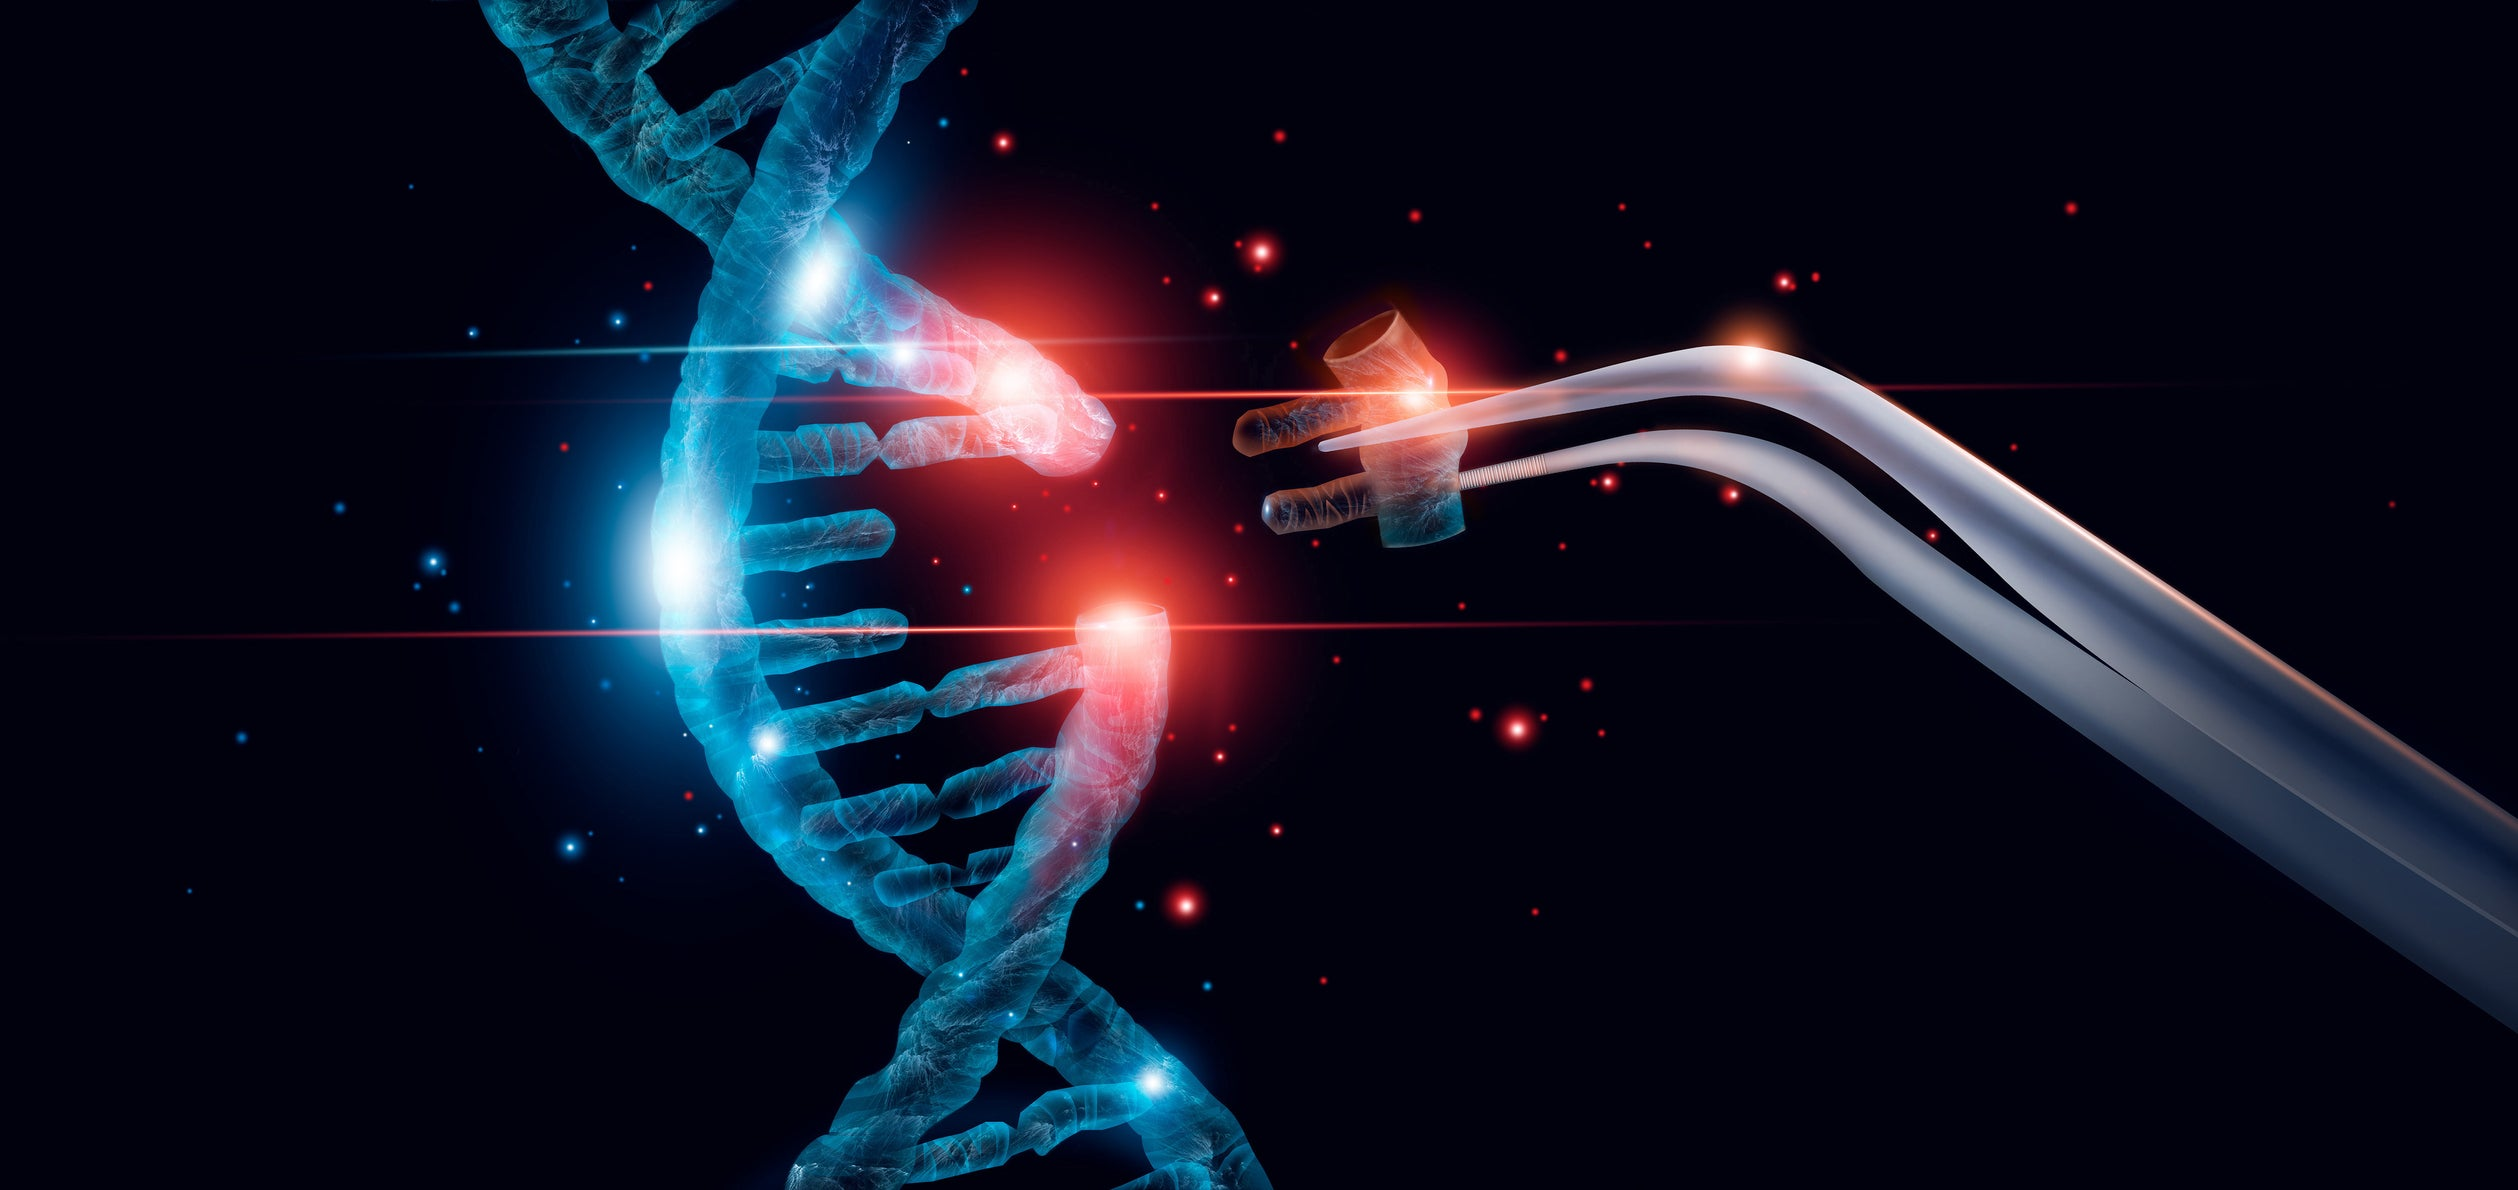 Is CRISPR Therapeutics the Best Gene-Editing Stock Right Now?